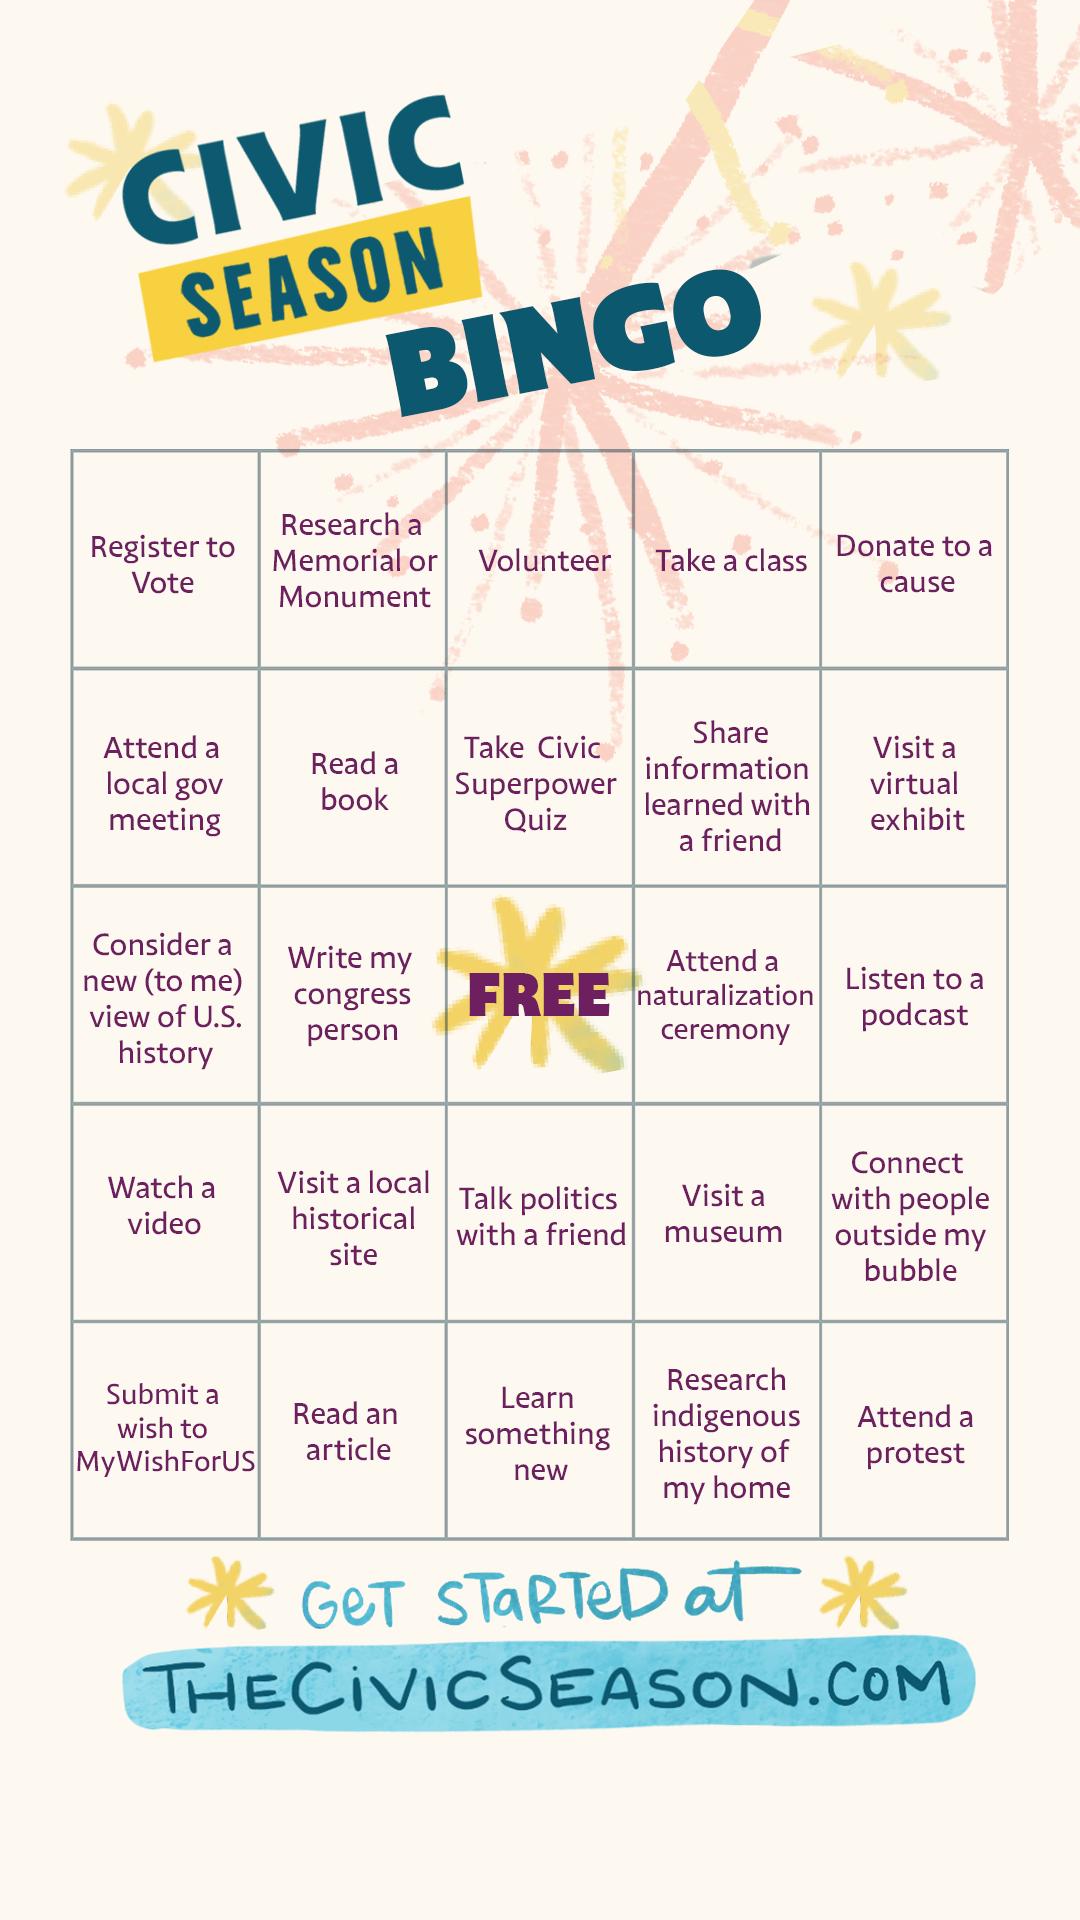 Civic Season Bingo Card